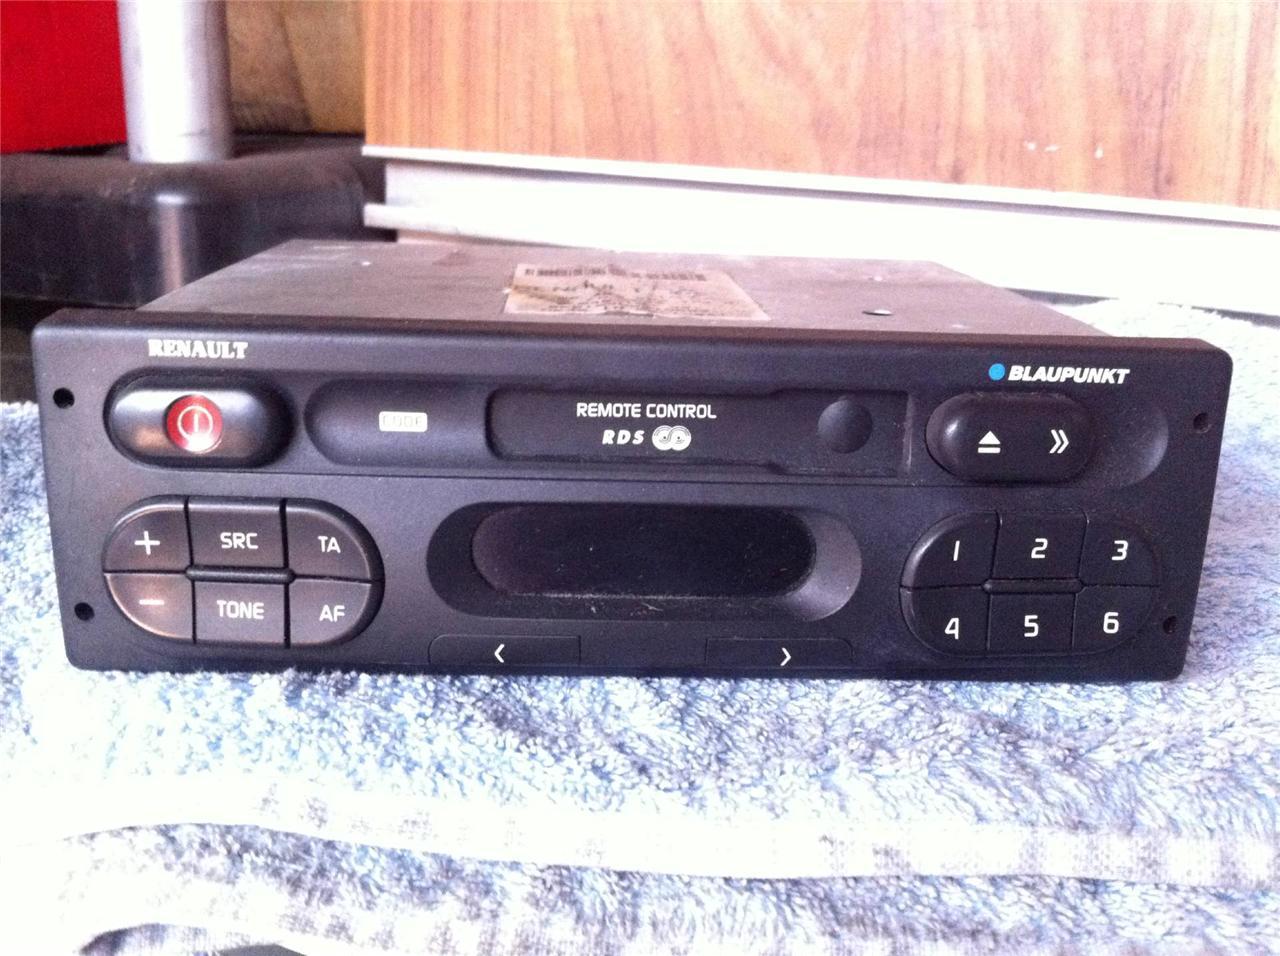 renault kangoo blaupunkt tape cassette player stereo head unit radio code ebay. Black Bedroom Furniture Sets. Home Design Ideas